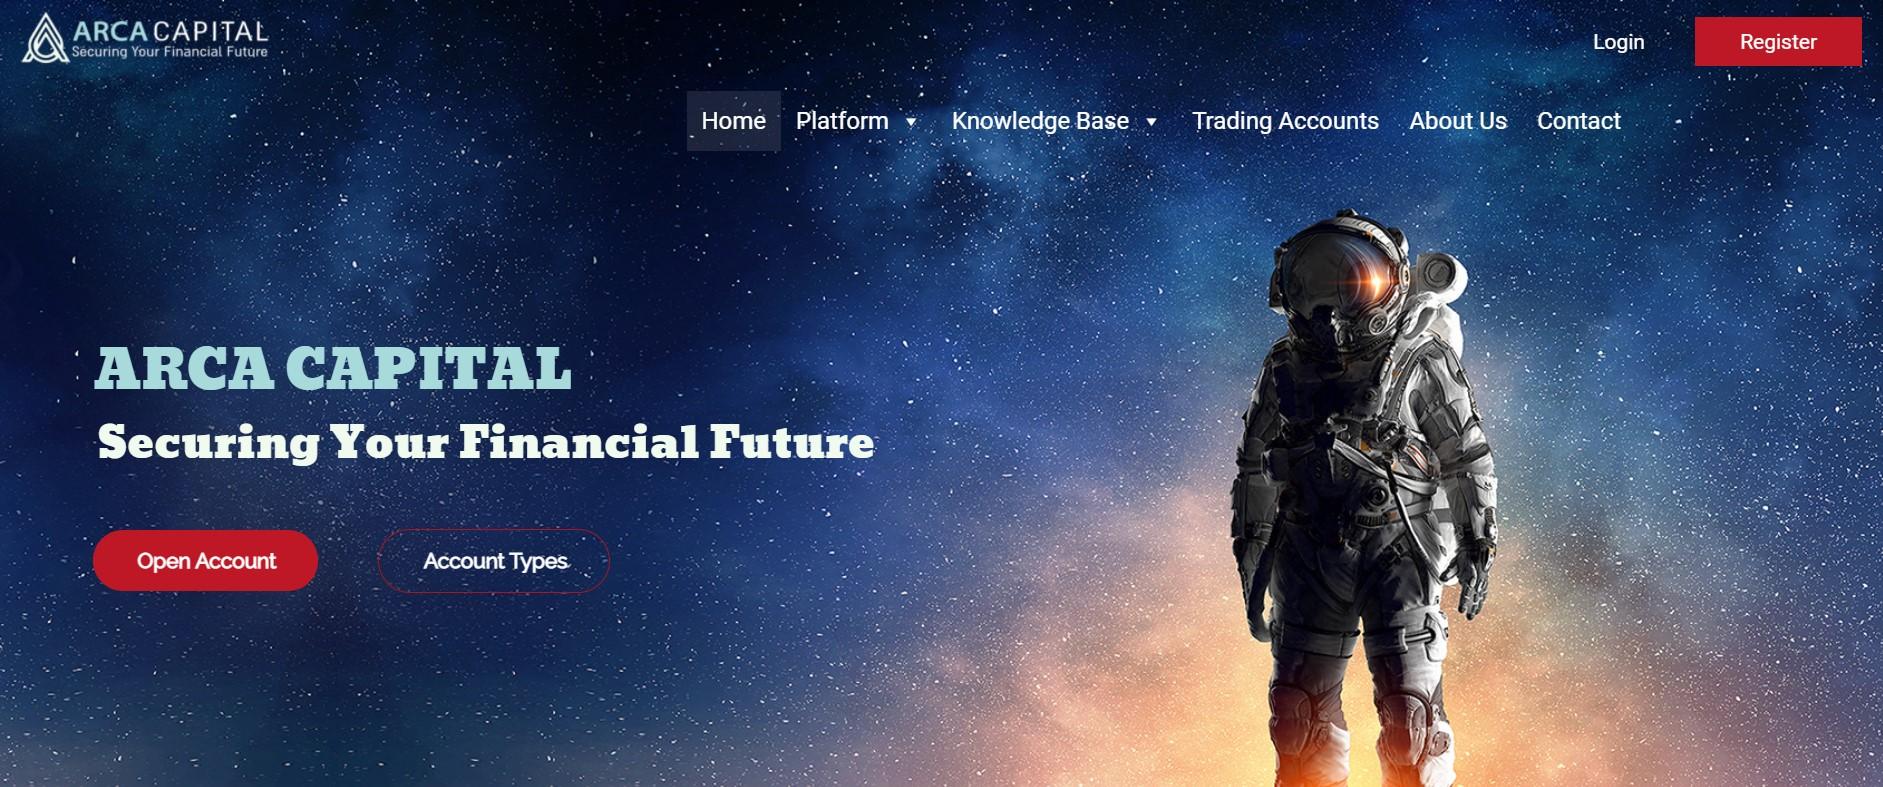 Arca Capital website